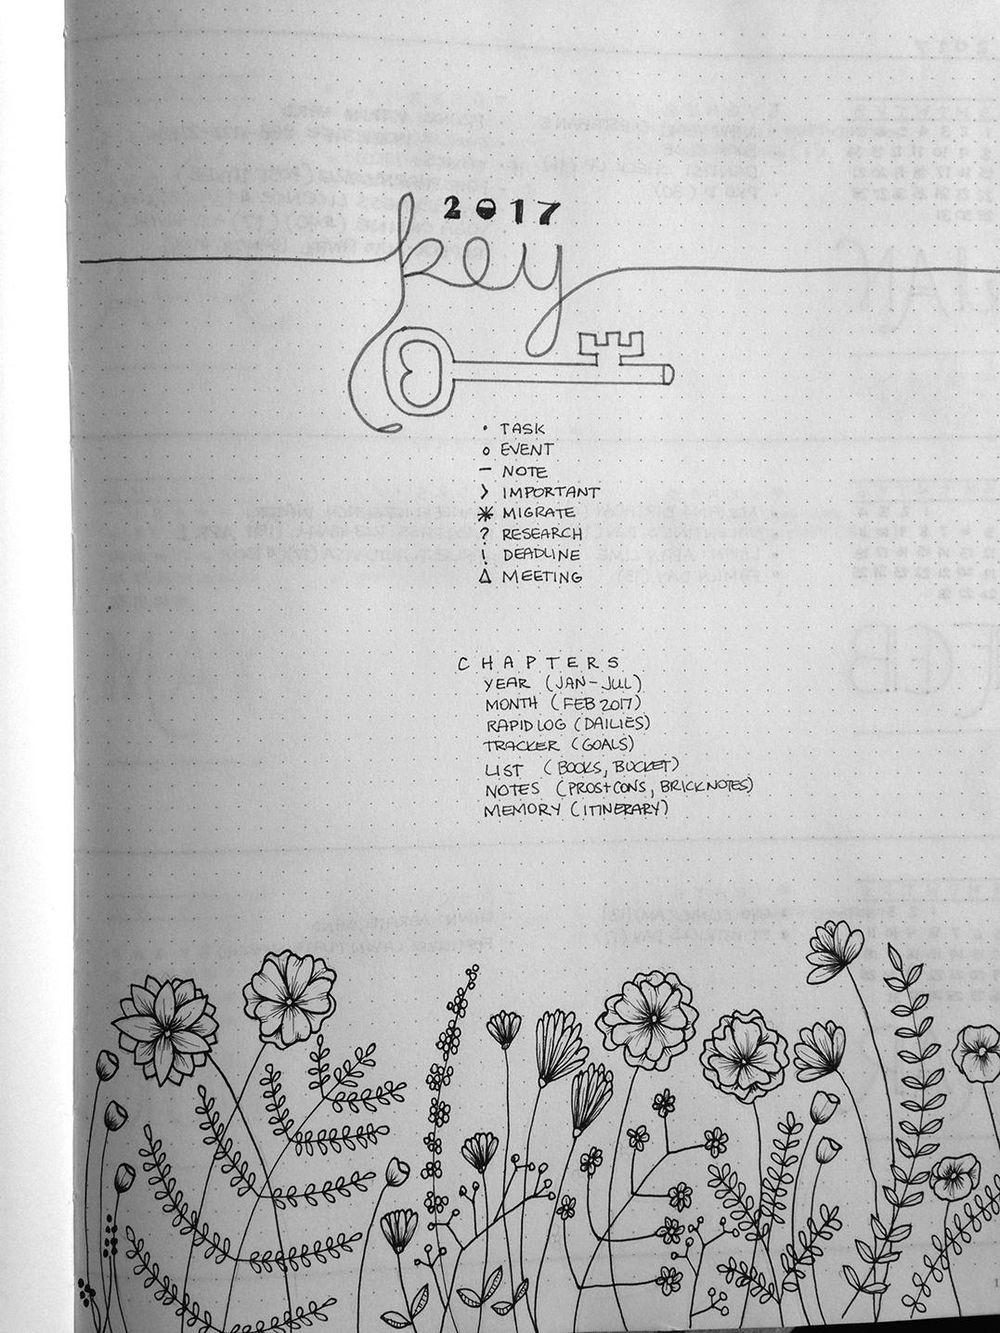 Bullet Journal Botanicals - image 4 - student project